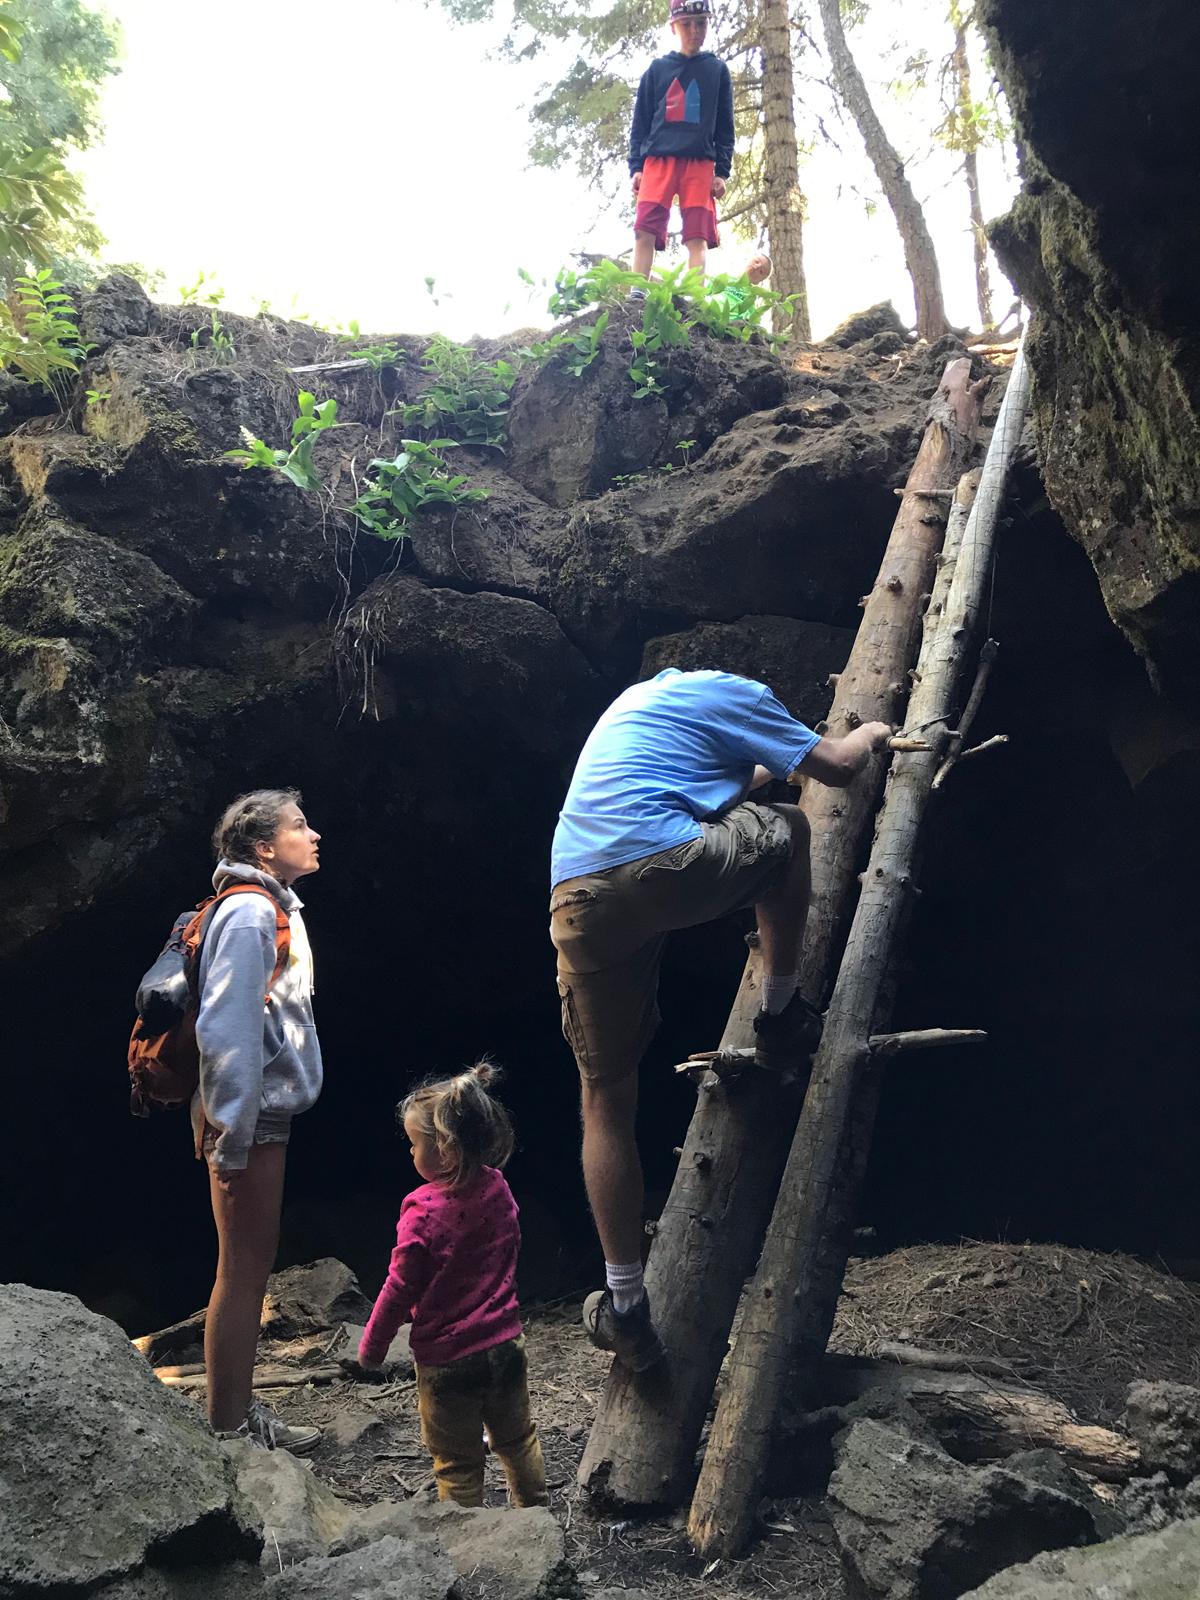 Skylight Cave's entrance